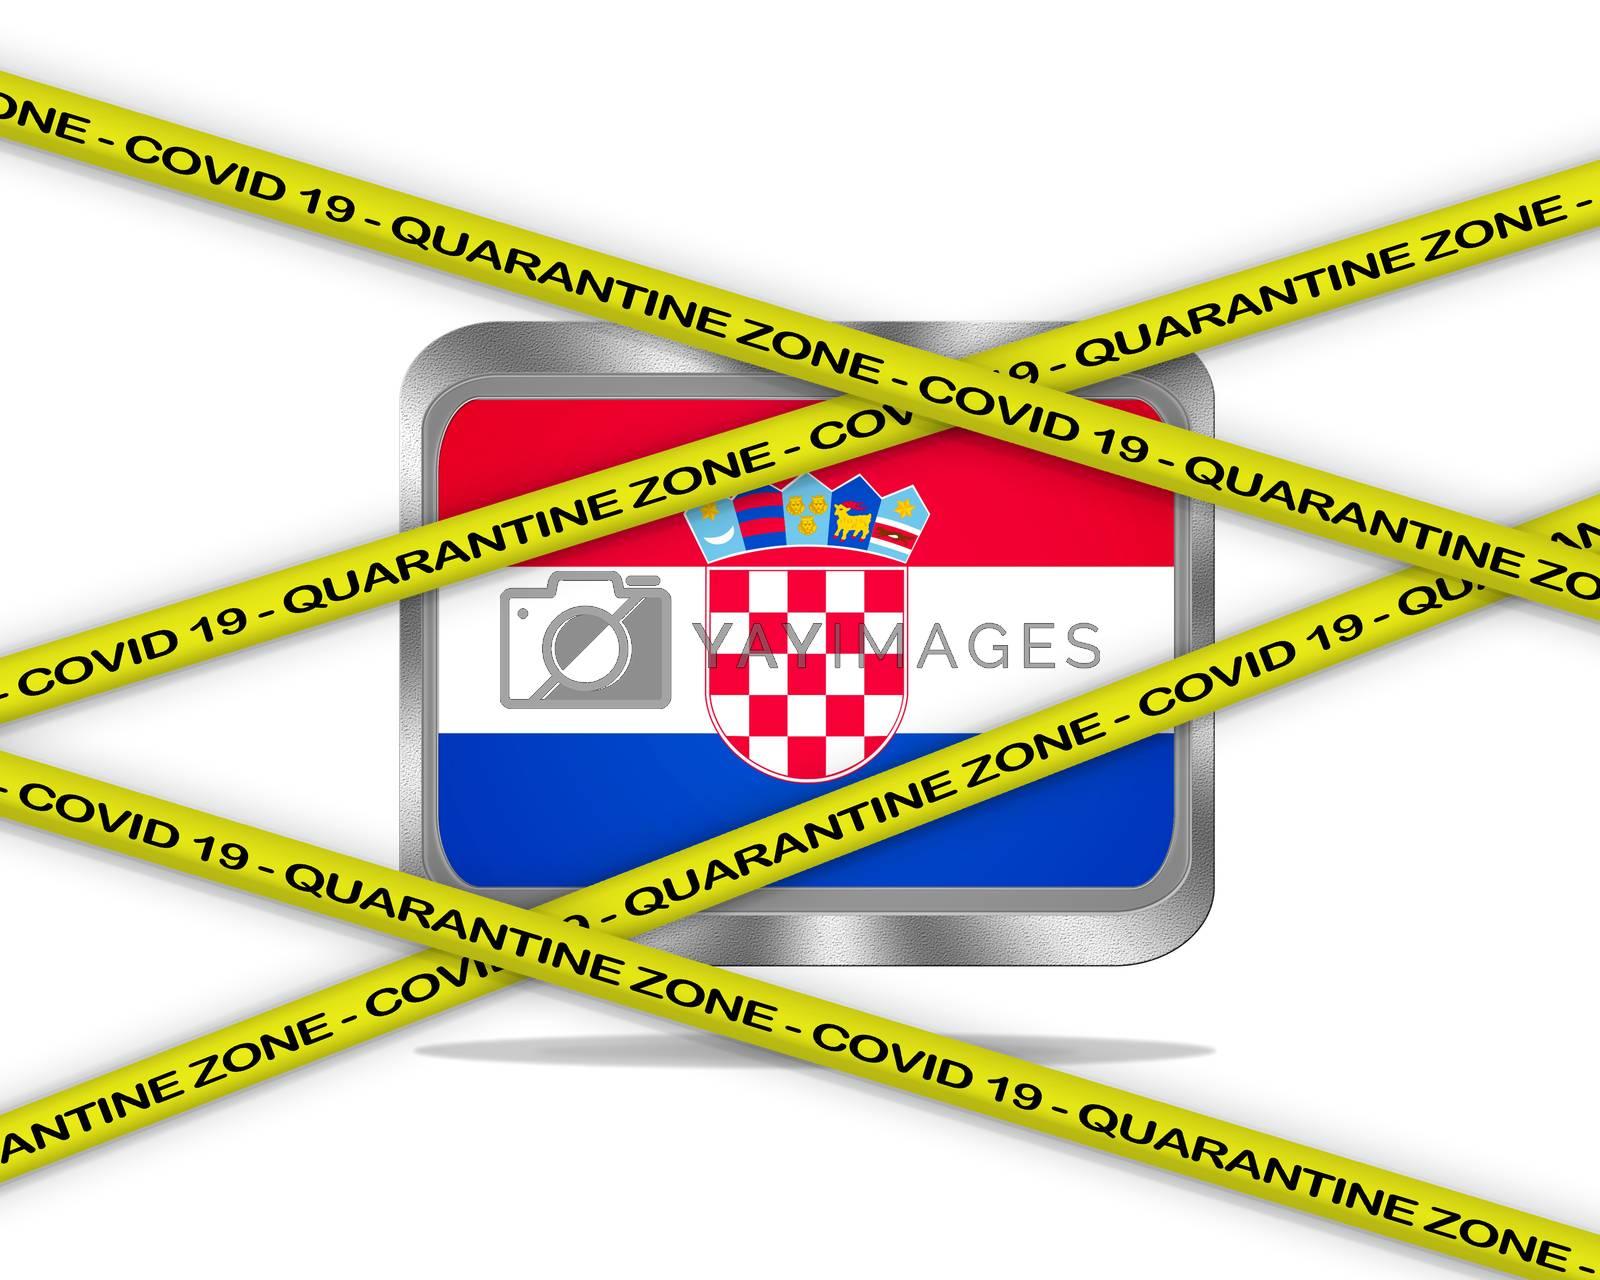 COVID-19 warning yellow ribbon written with: Quarantine zone Cover 19 on Croatia flag illustration. Coronavirus danger area, quarantined country.